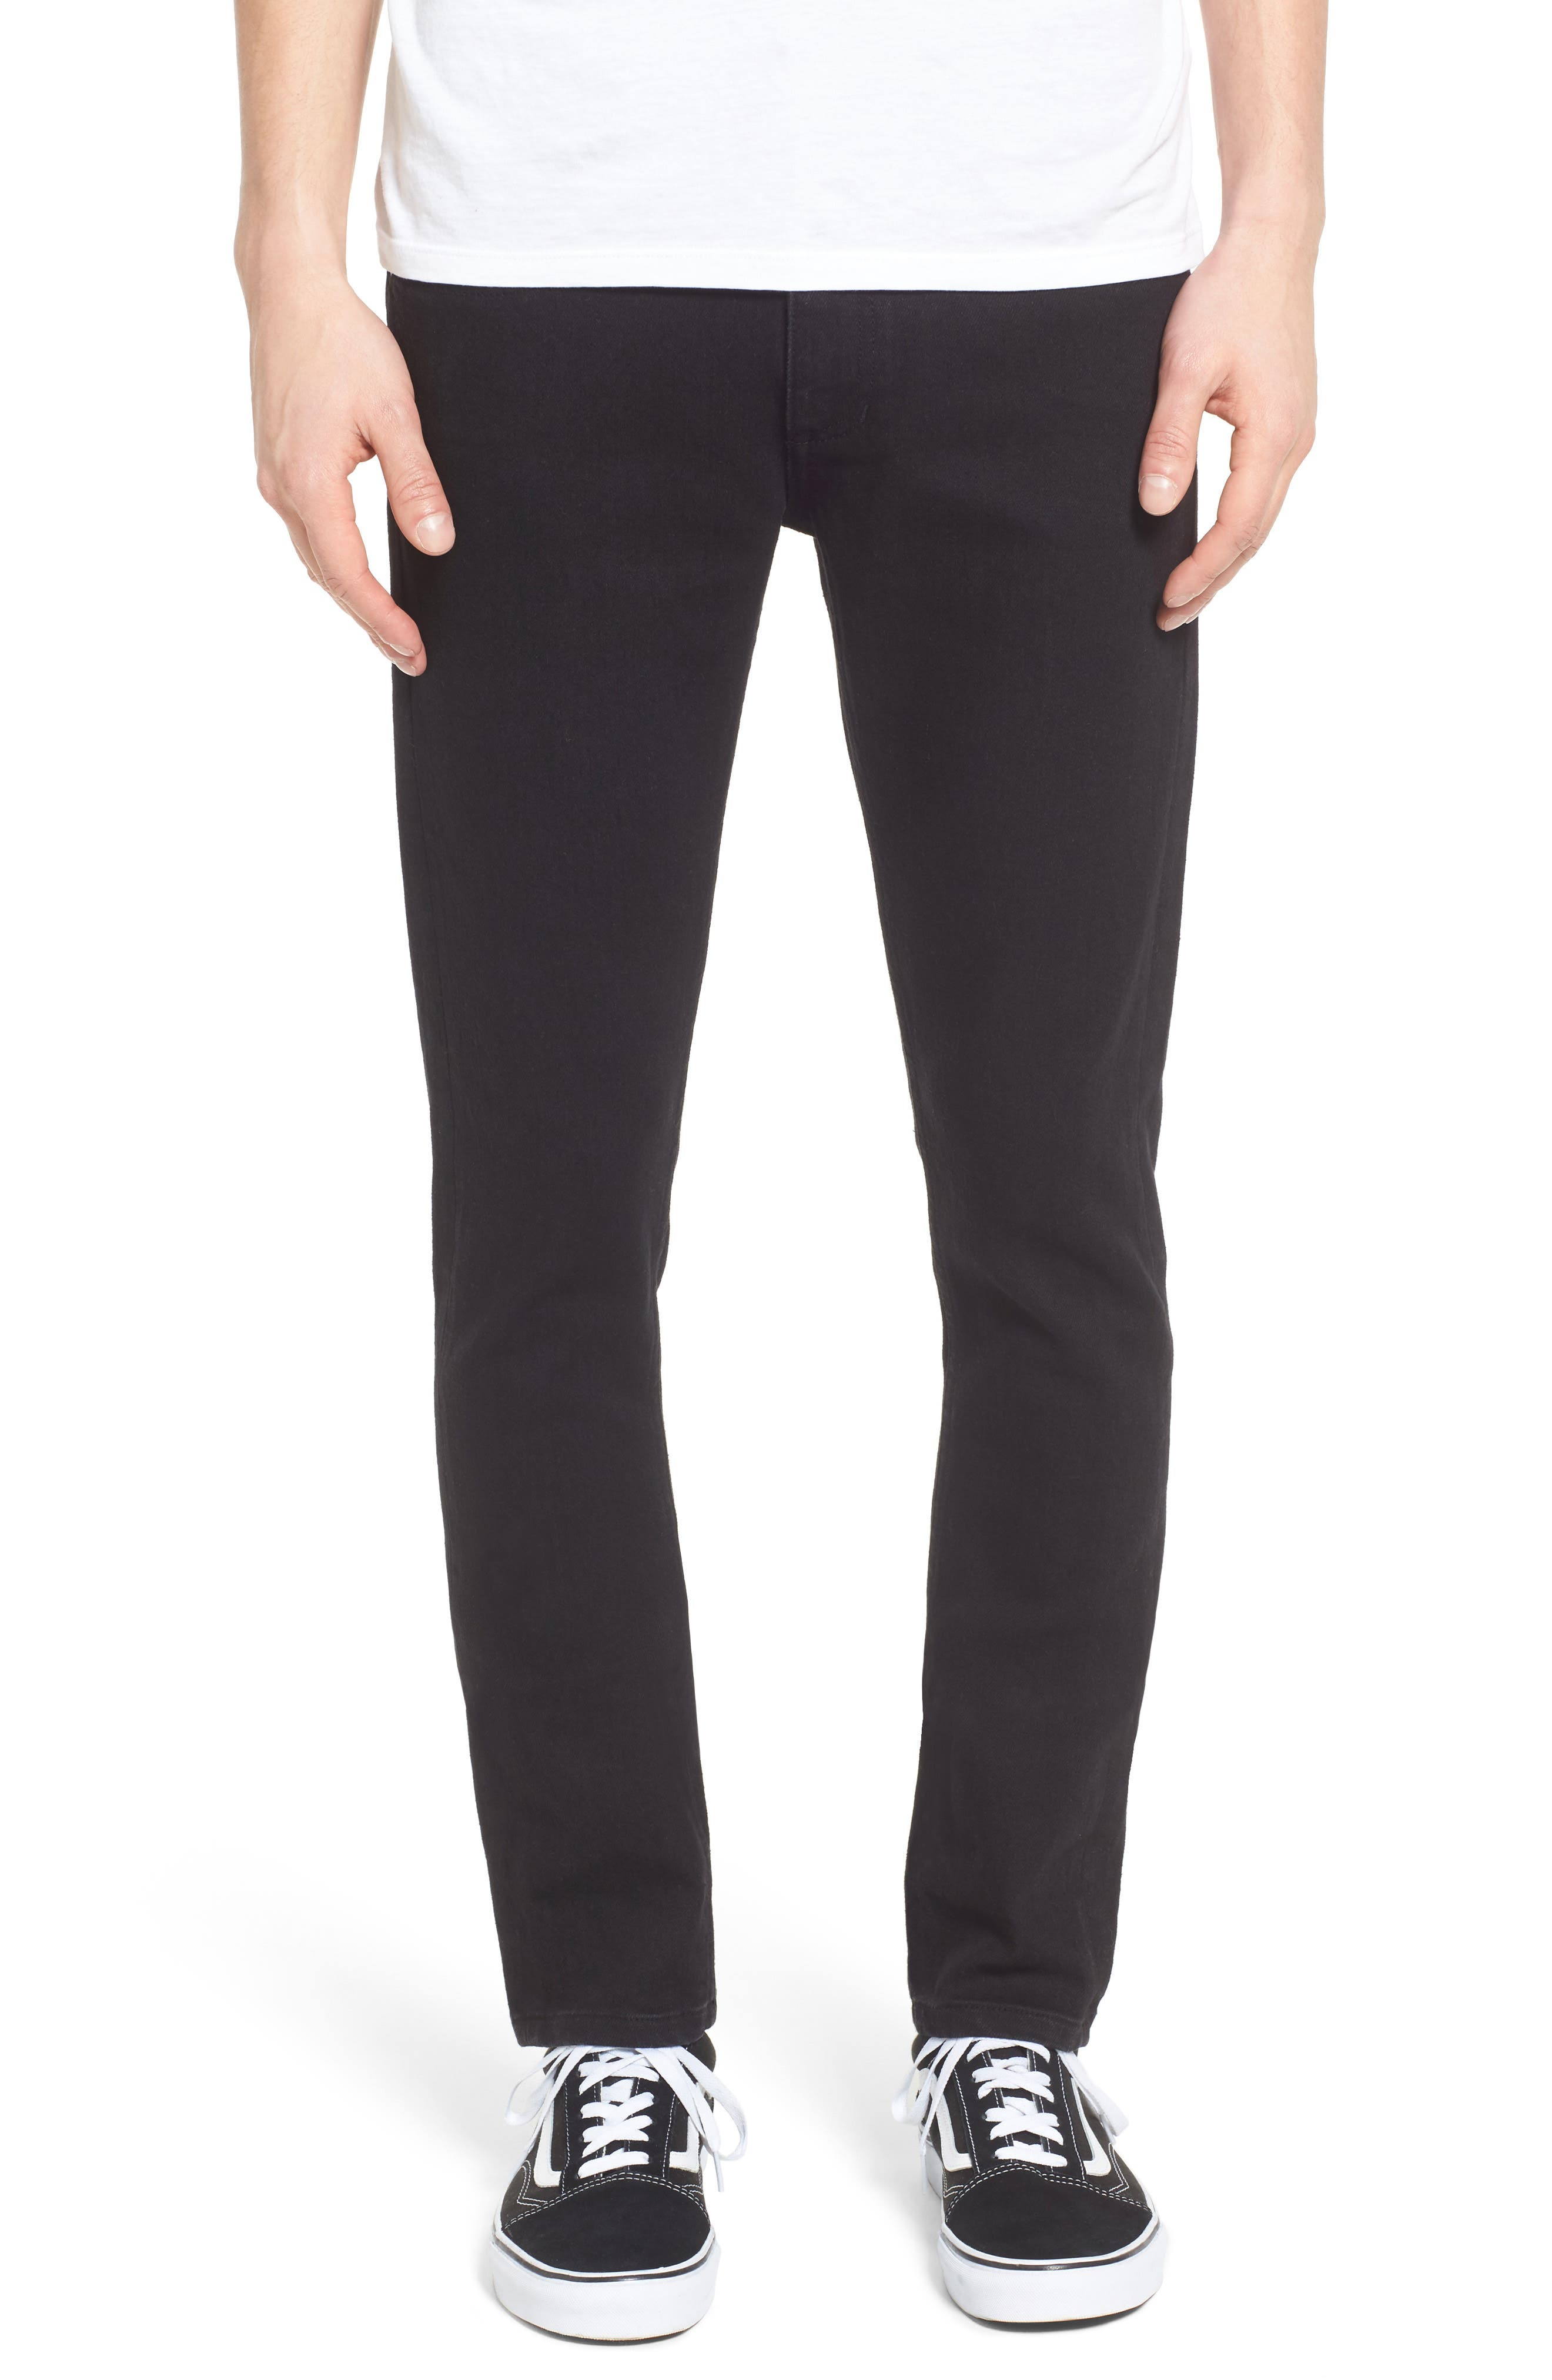 Juvee II Skinny Fit Jeans,                             Main thumbnail 1, color,                             Black